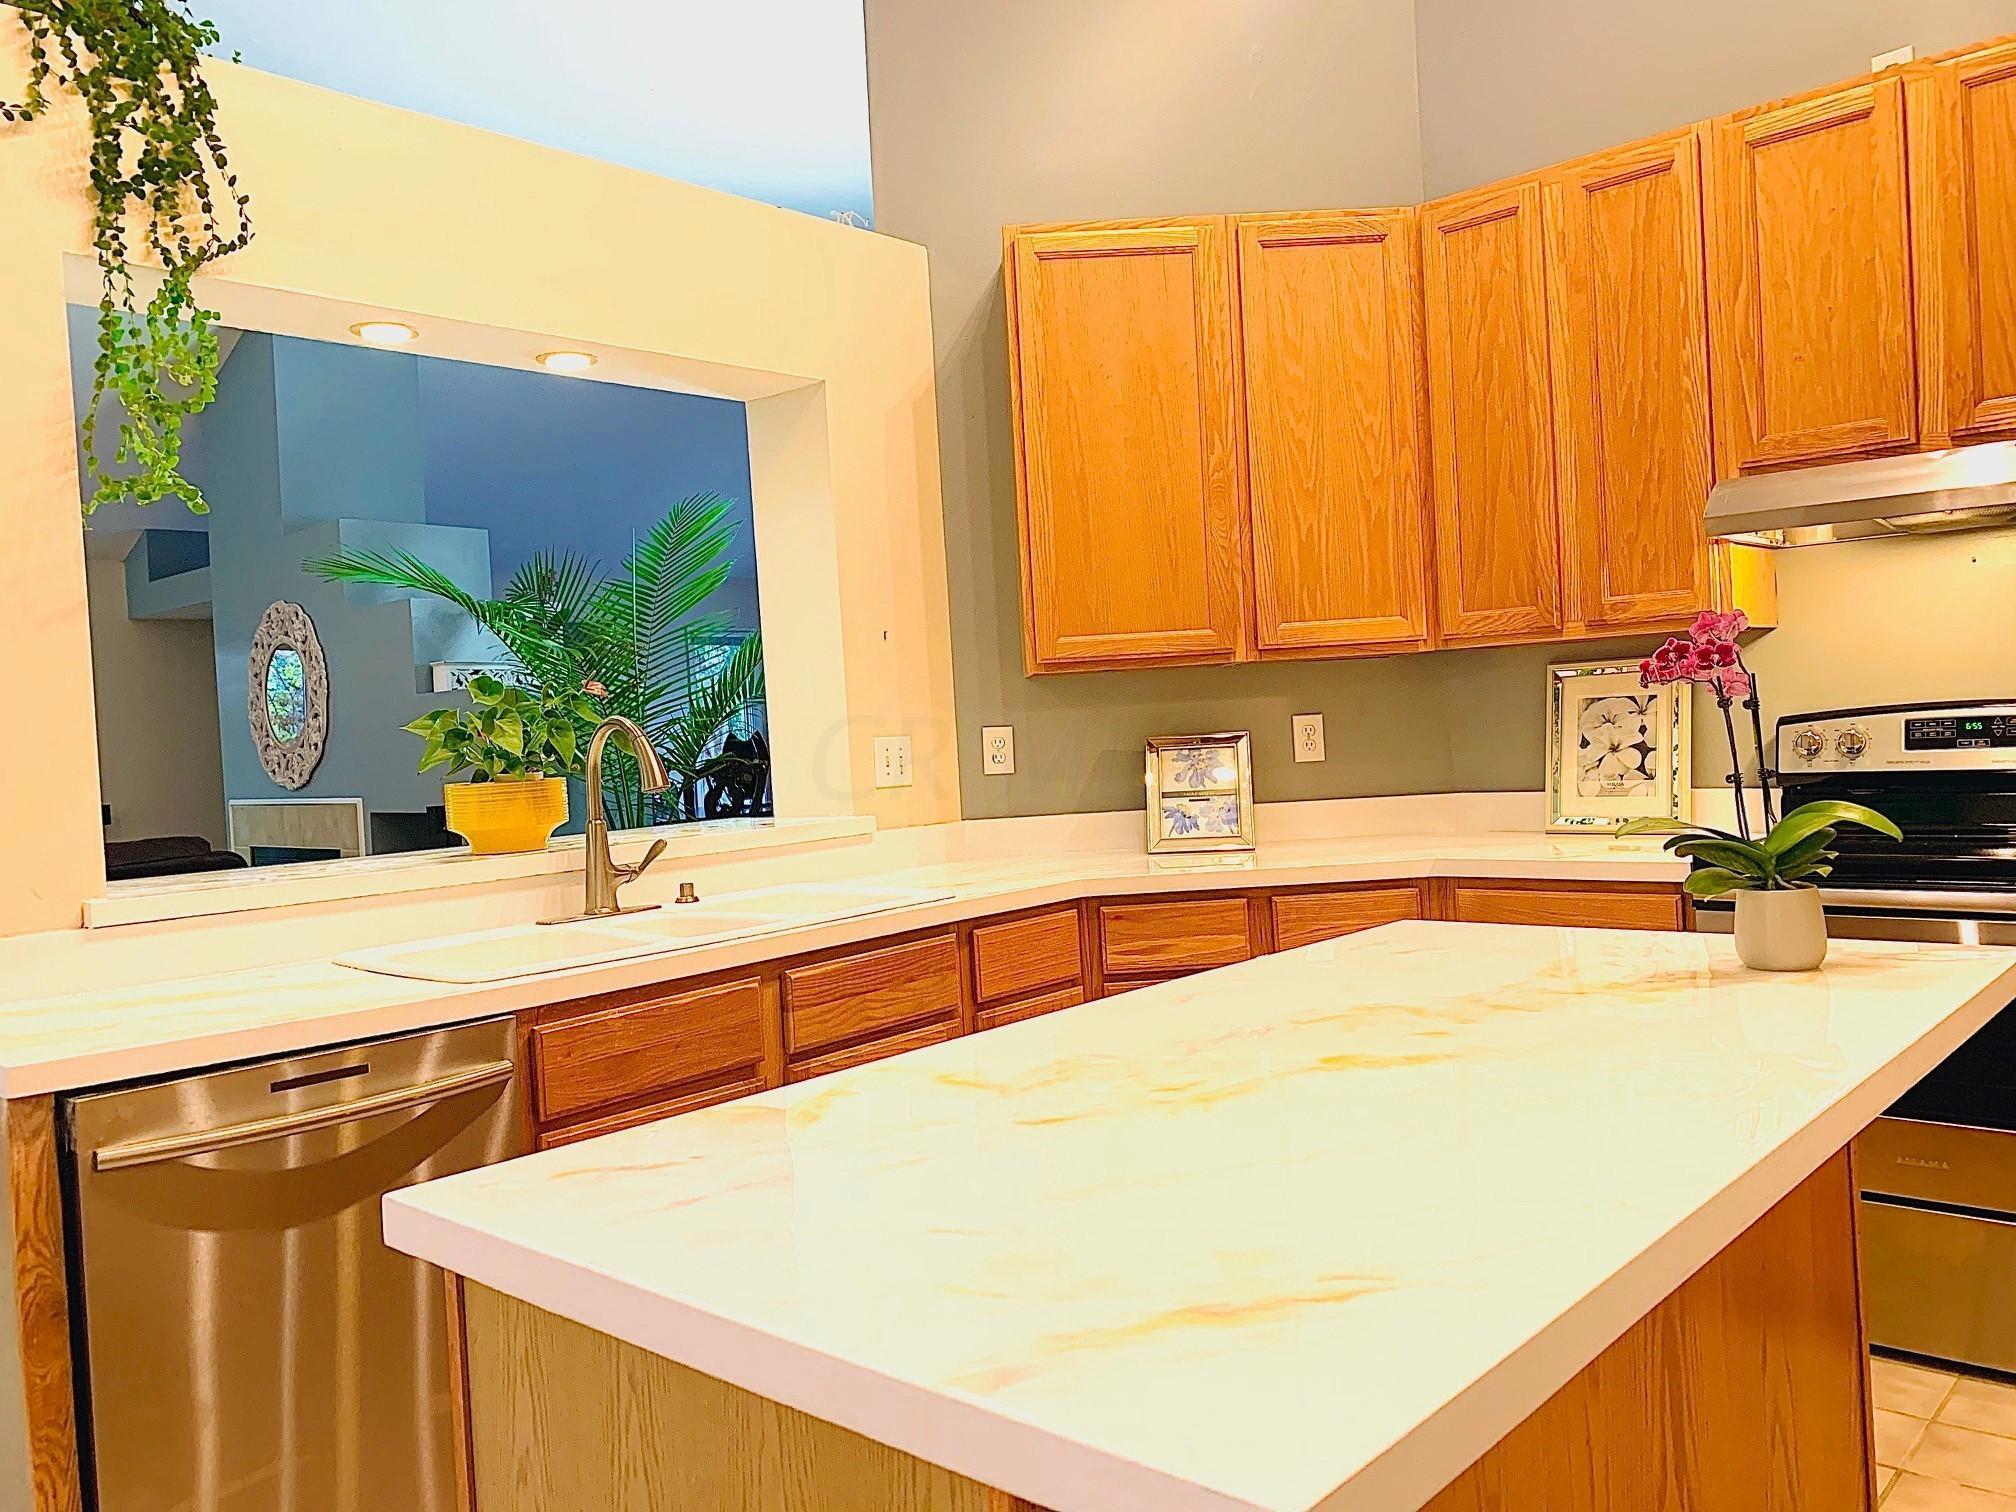 6249 Balmoral Drive, Dublin, Ohio 43017, 4 Bedrooms Bedrooms, ,3 BathroomsBathrooms,Residential,For Sale,Balmoral,219037021